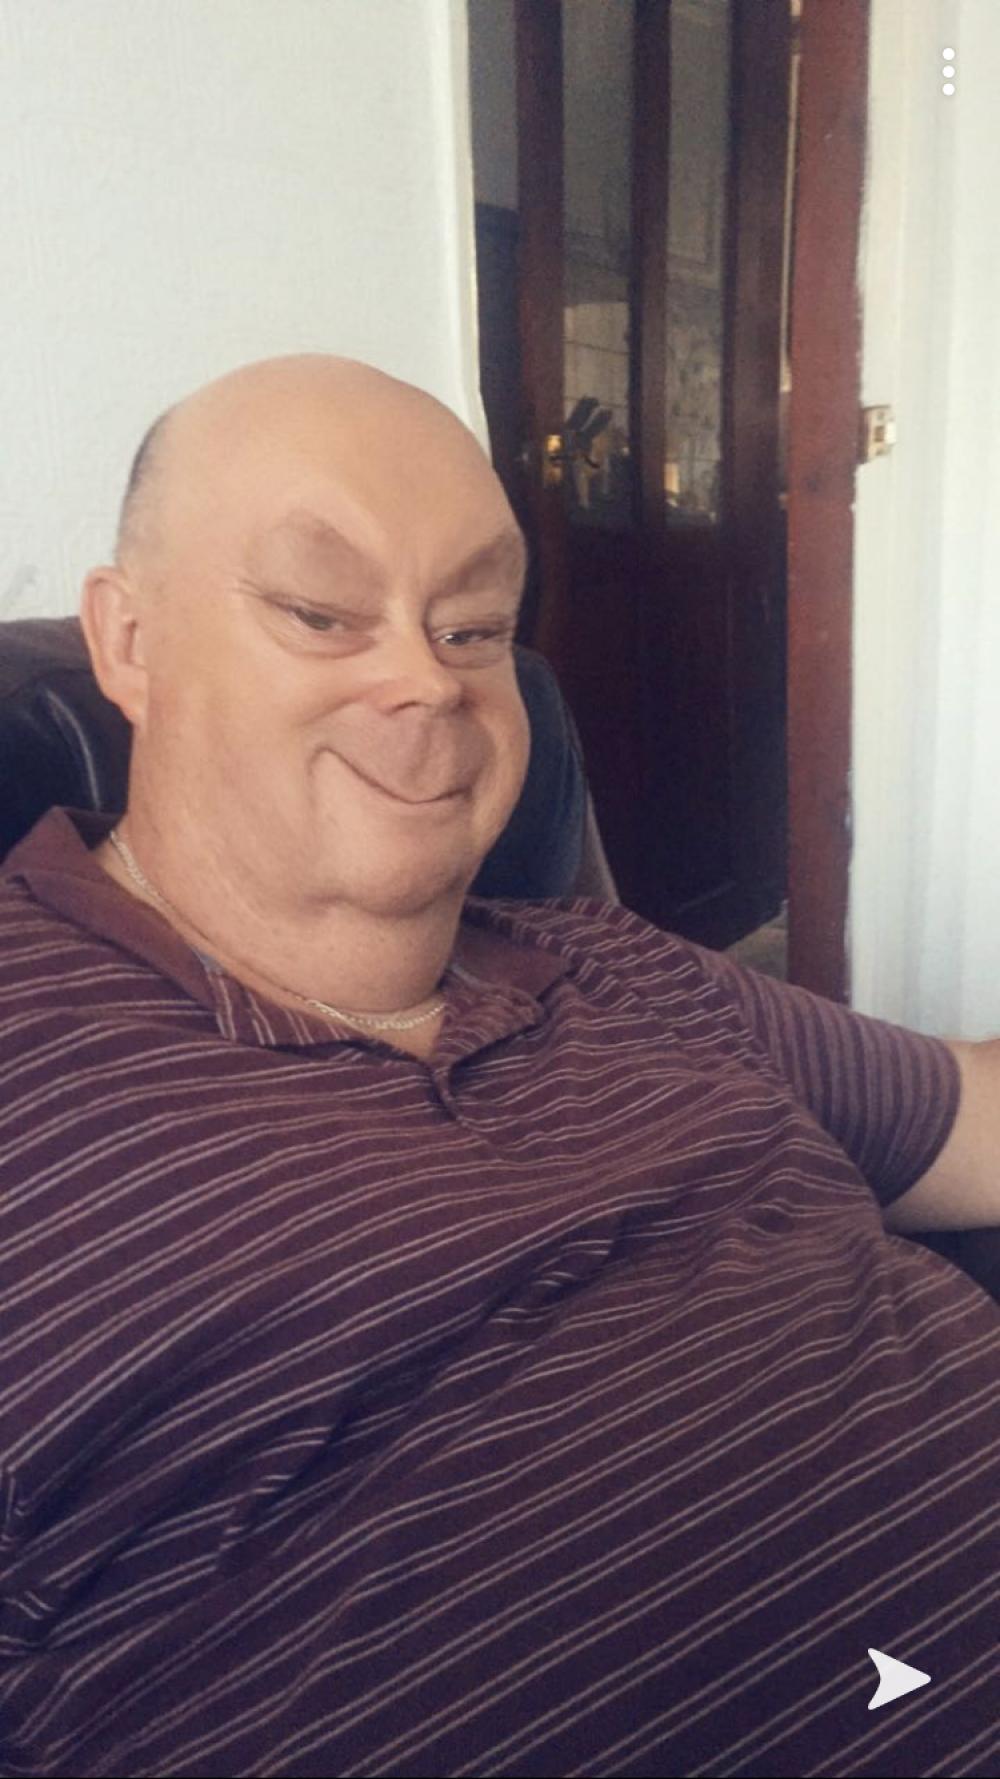 Happy birthday dad 17th of April